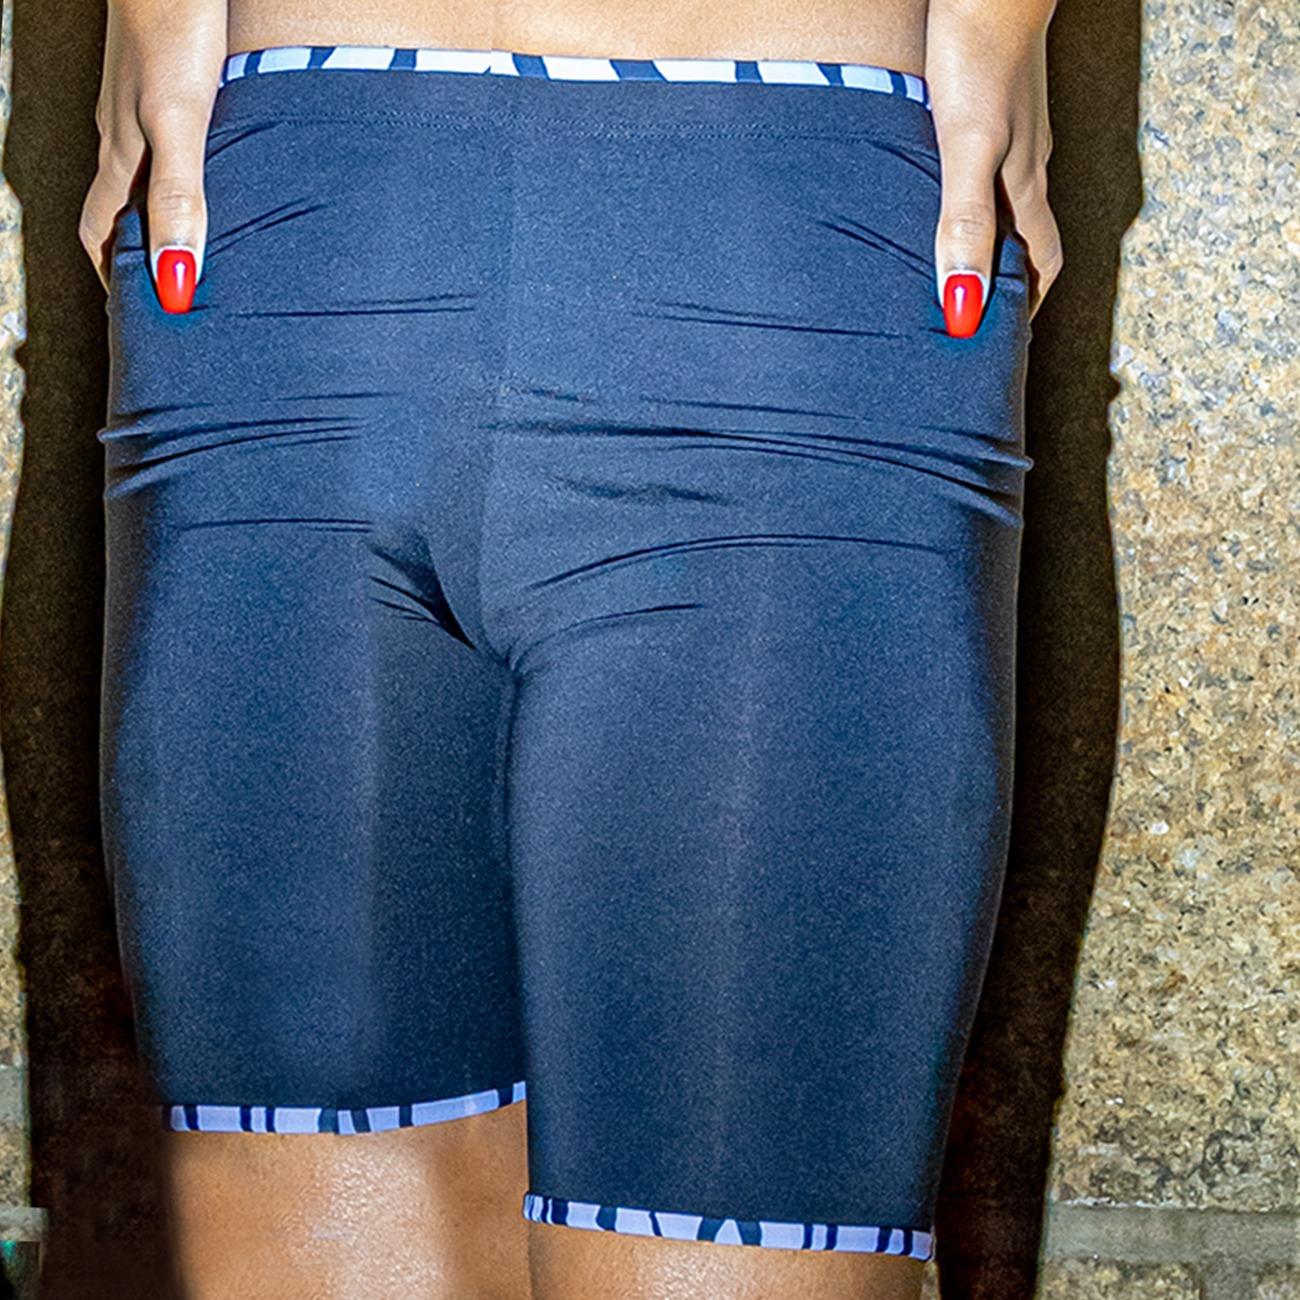 Add Biker Shorts